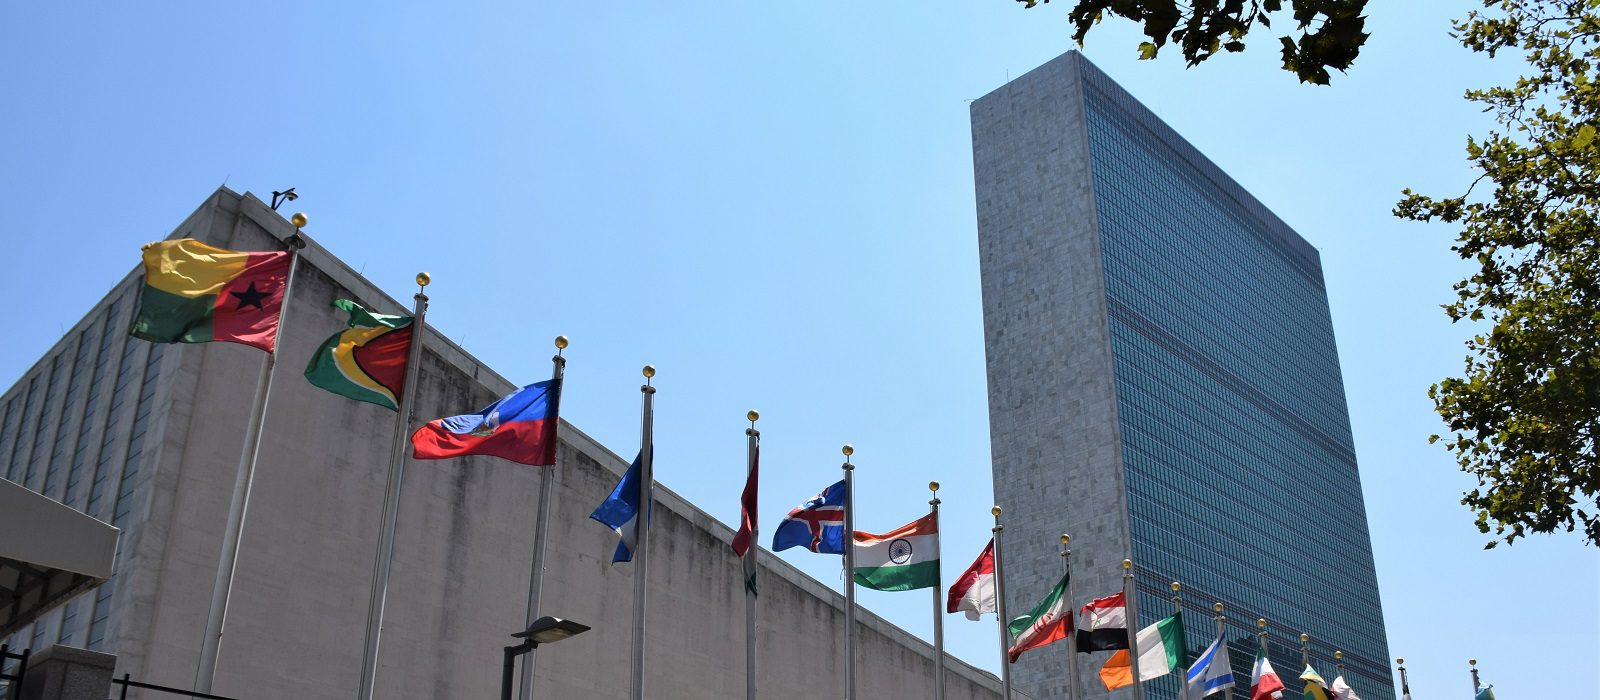 Siège des Nations unies (ONU), New York - 19 août 2019